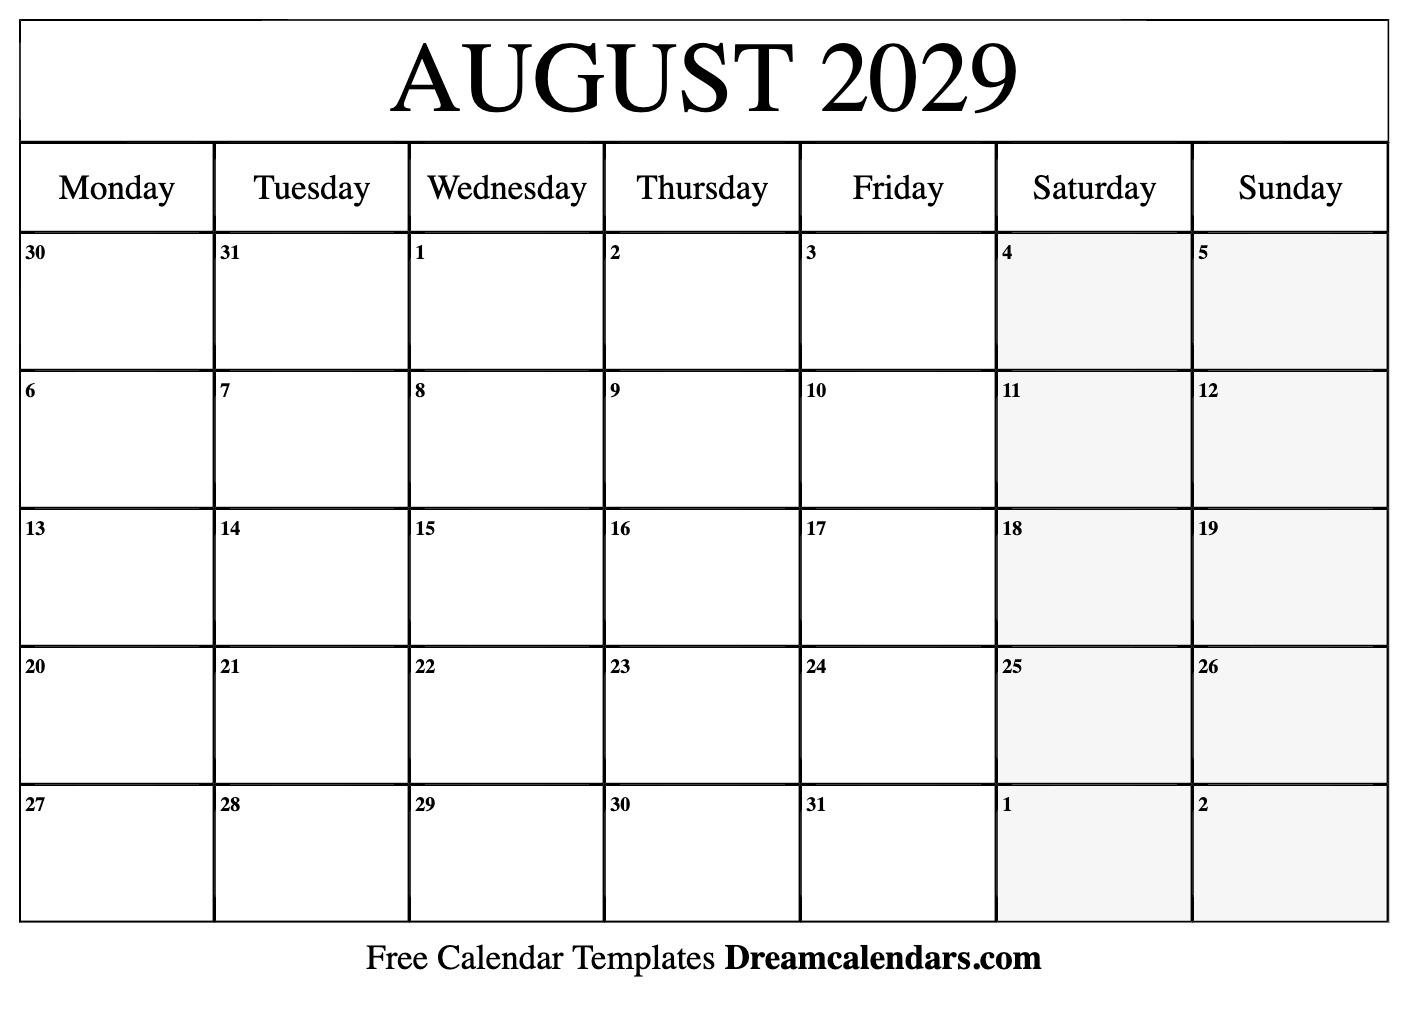 image about Free Printable Aug Calendar named Printable August 2029 Calendar